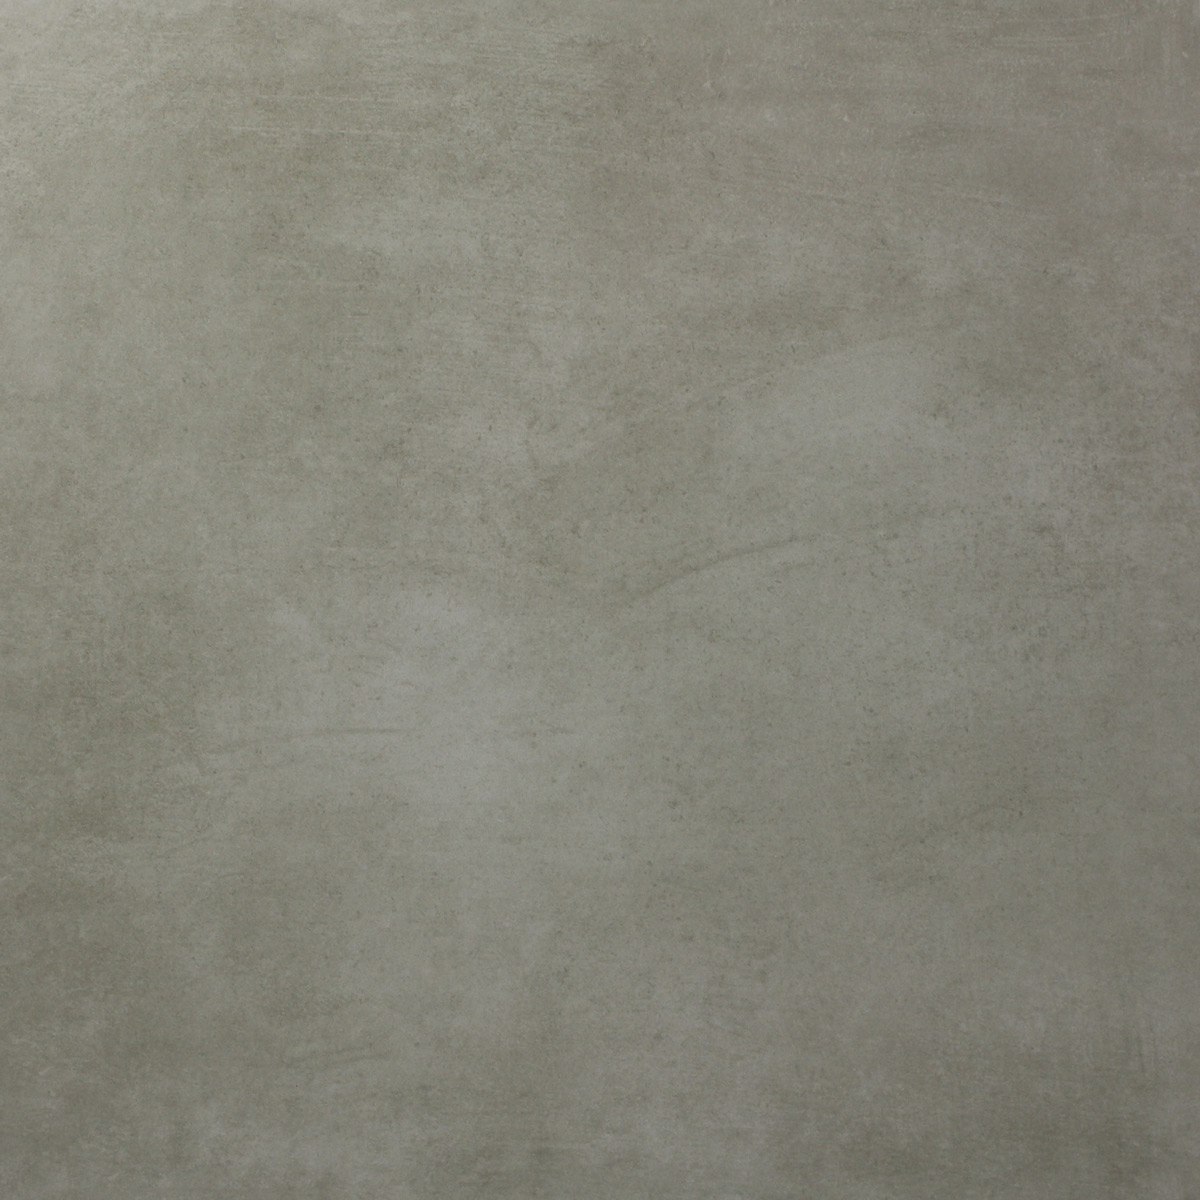 Cinque Colonia Boden-/Wandfliese beige 60x60